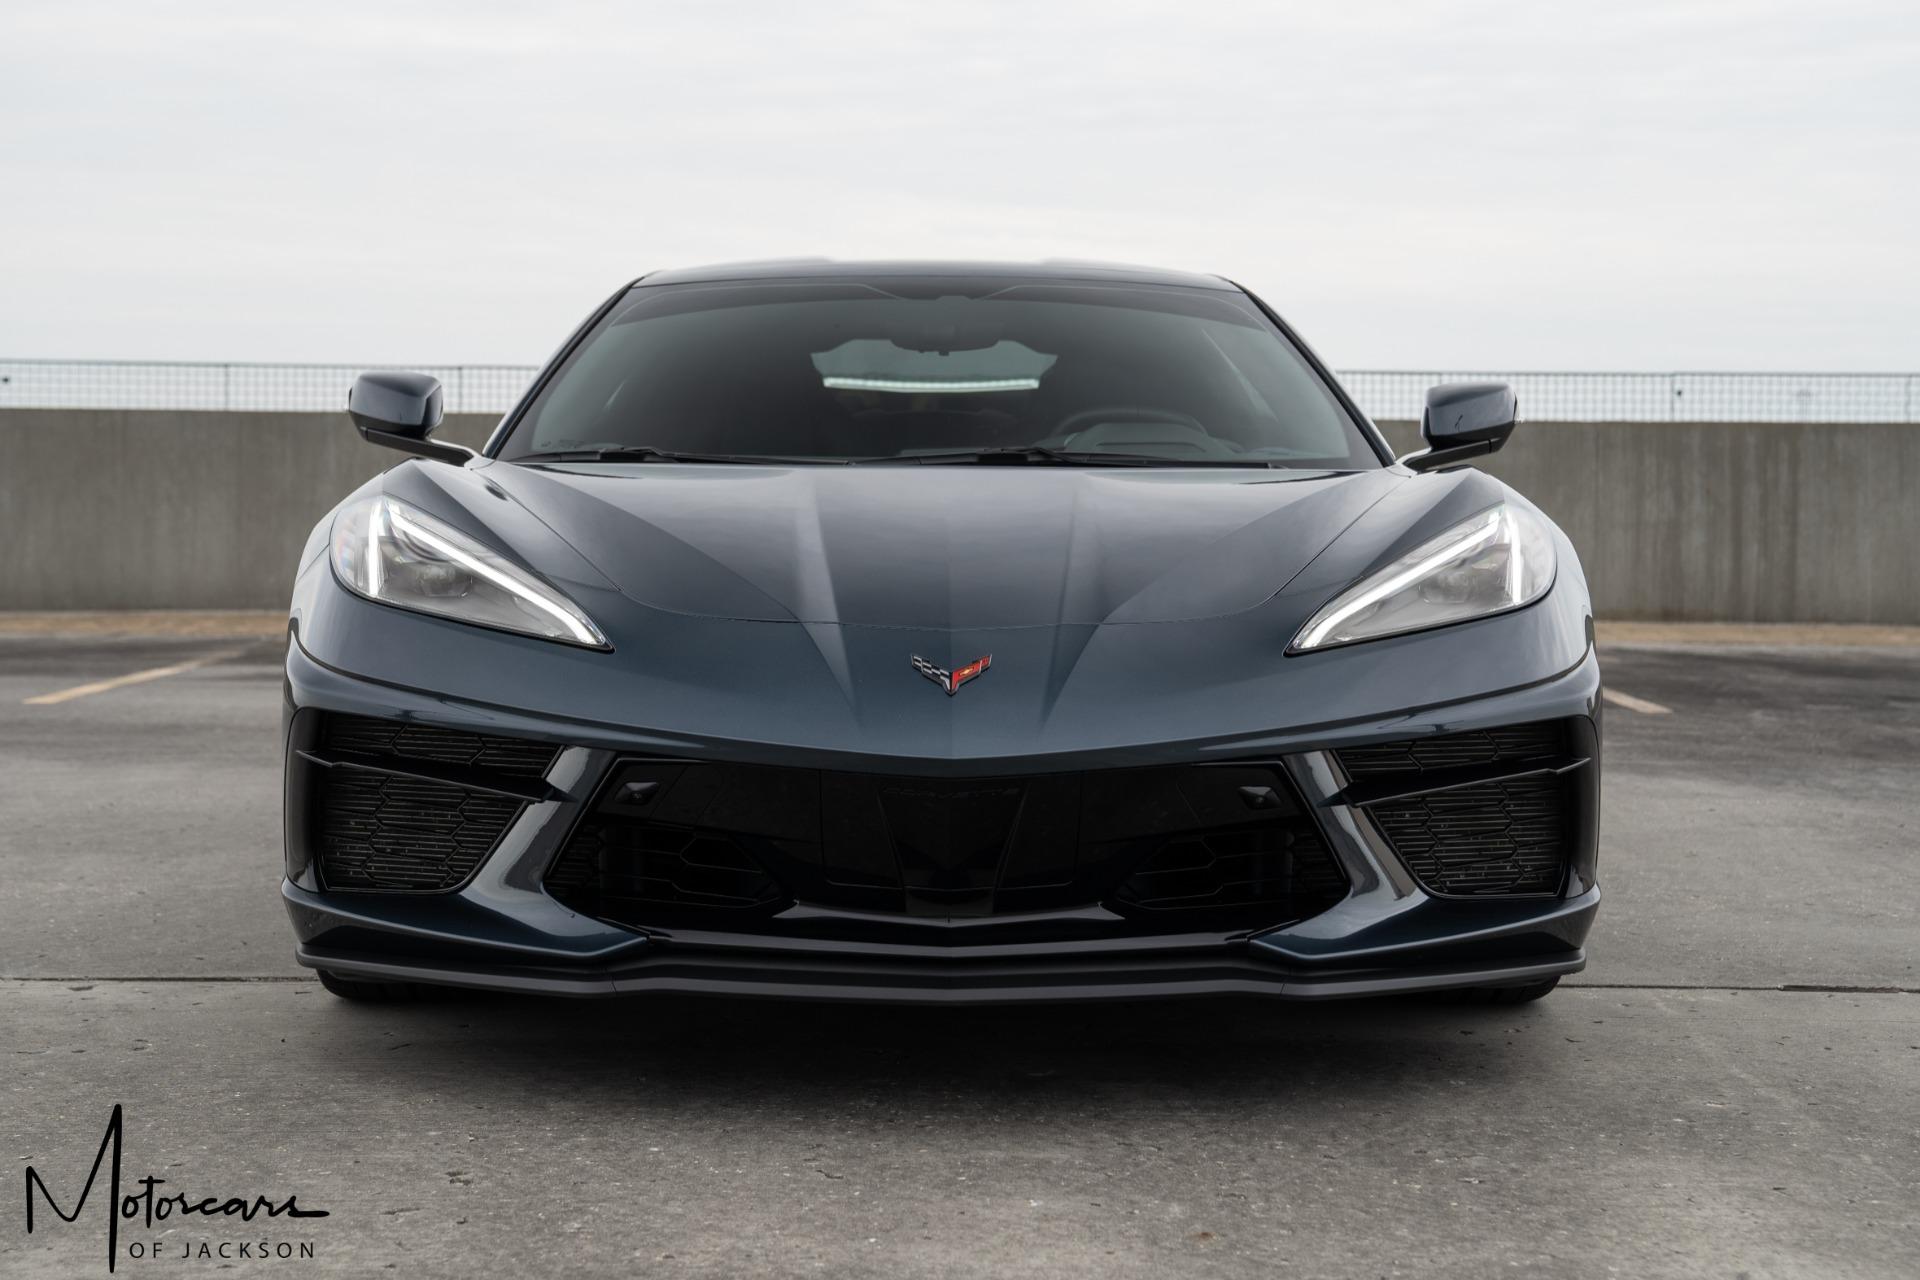 Used-2020-Chevrolet-Corvette-2LT-Z51-Front-Lifter-for-sale-Jackson-MS